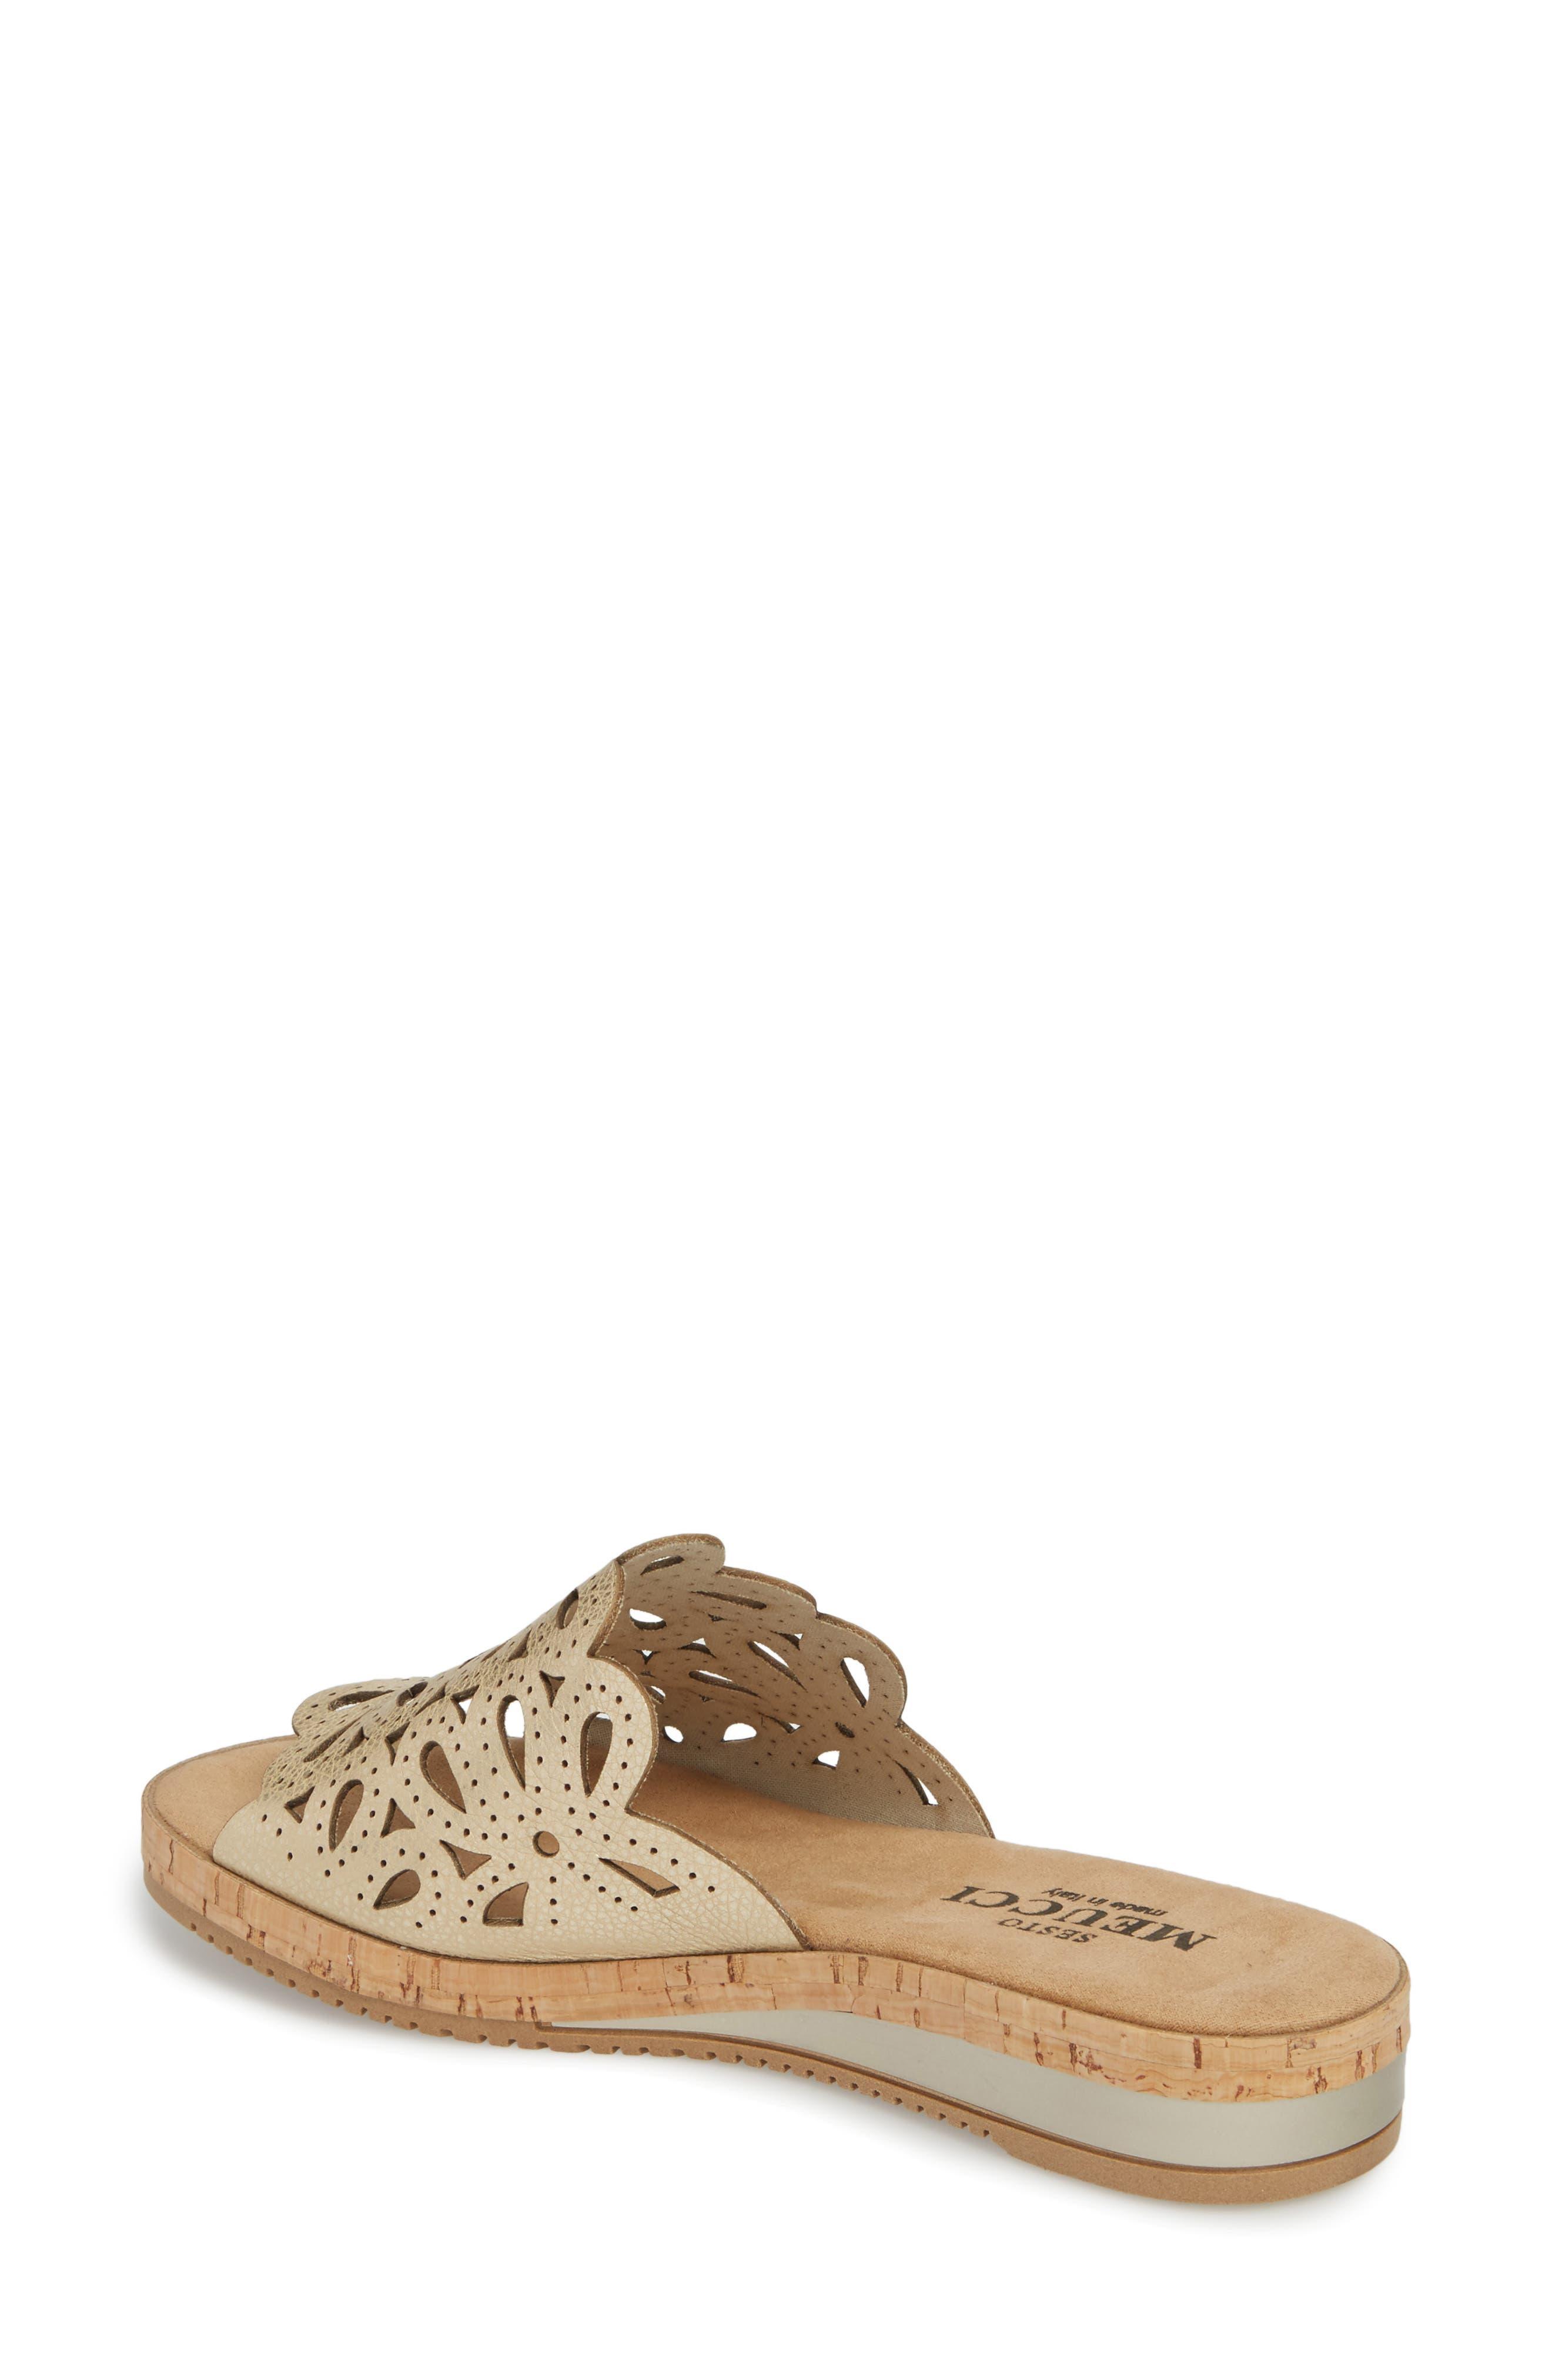 Selina Slide Sandal,                             Alternate thumbnail 2, color,                             Platino Leather